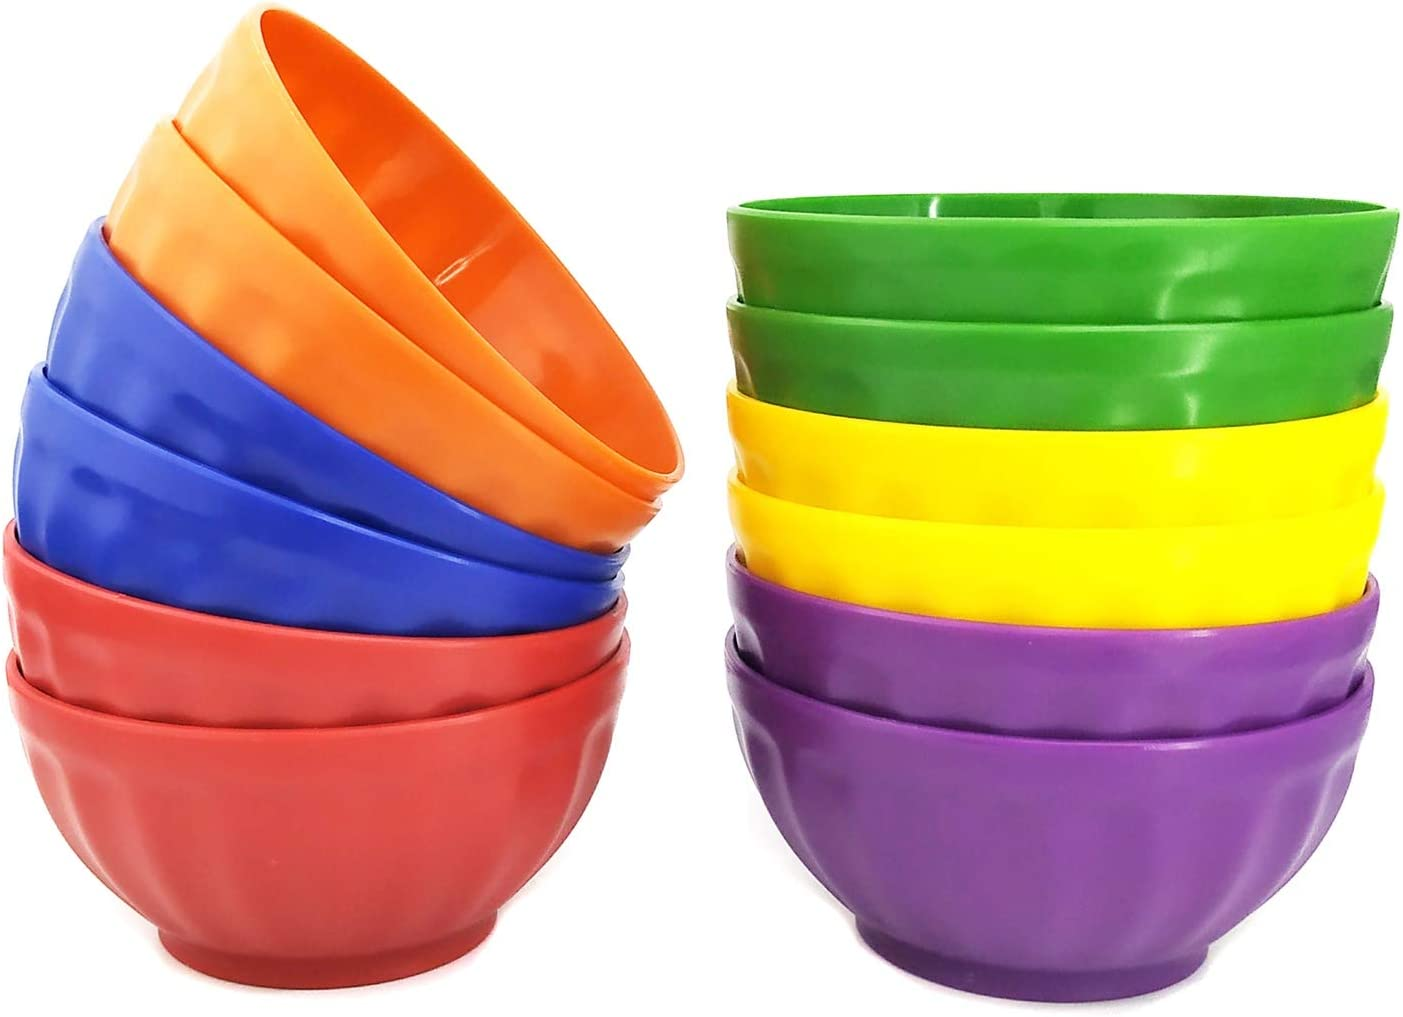 Unbreakable 28-ounce Plastic Bowls Salad Bowls Cereal Bowls, Set of 12 Multicolor - Dishwasher safe, BPA Free